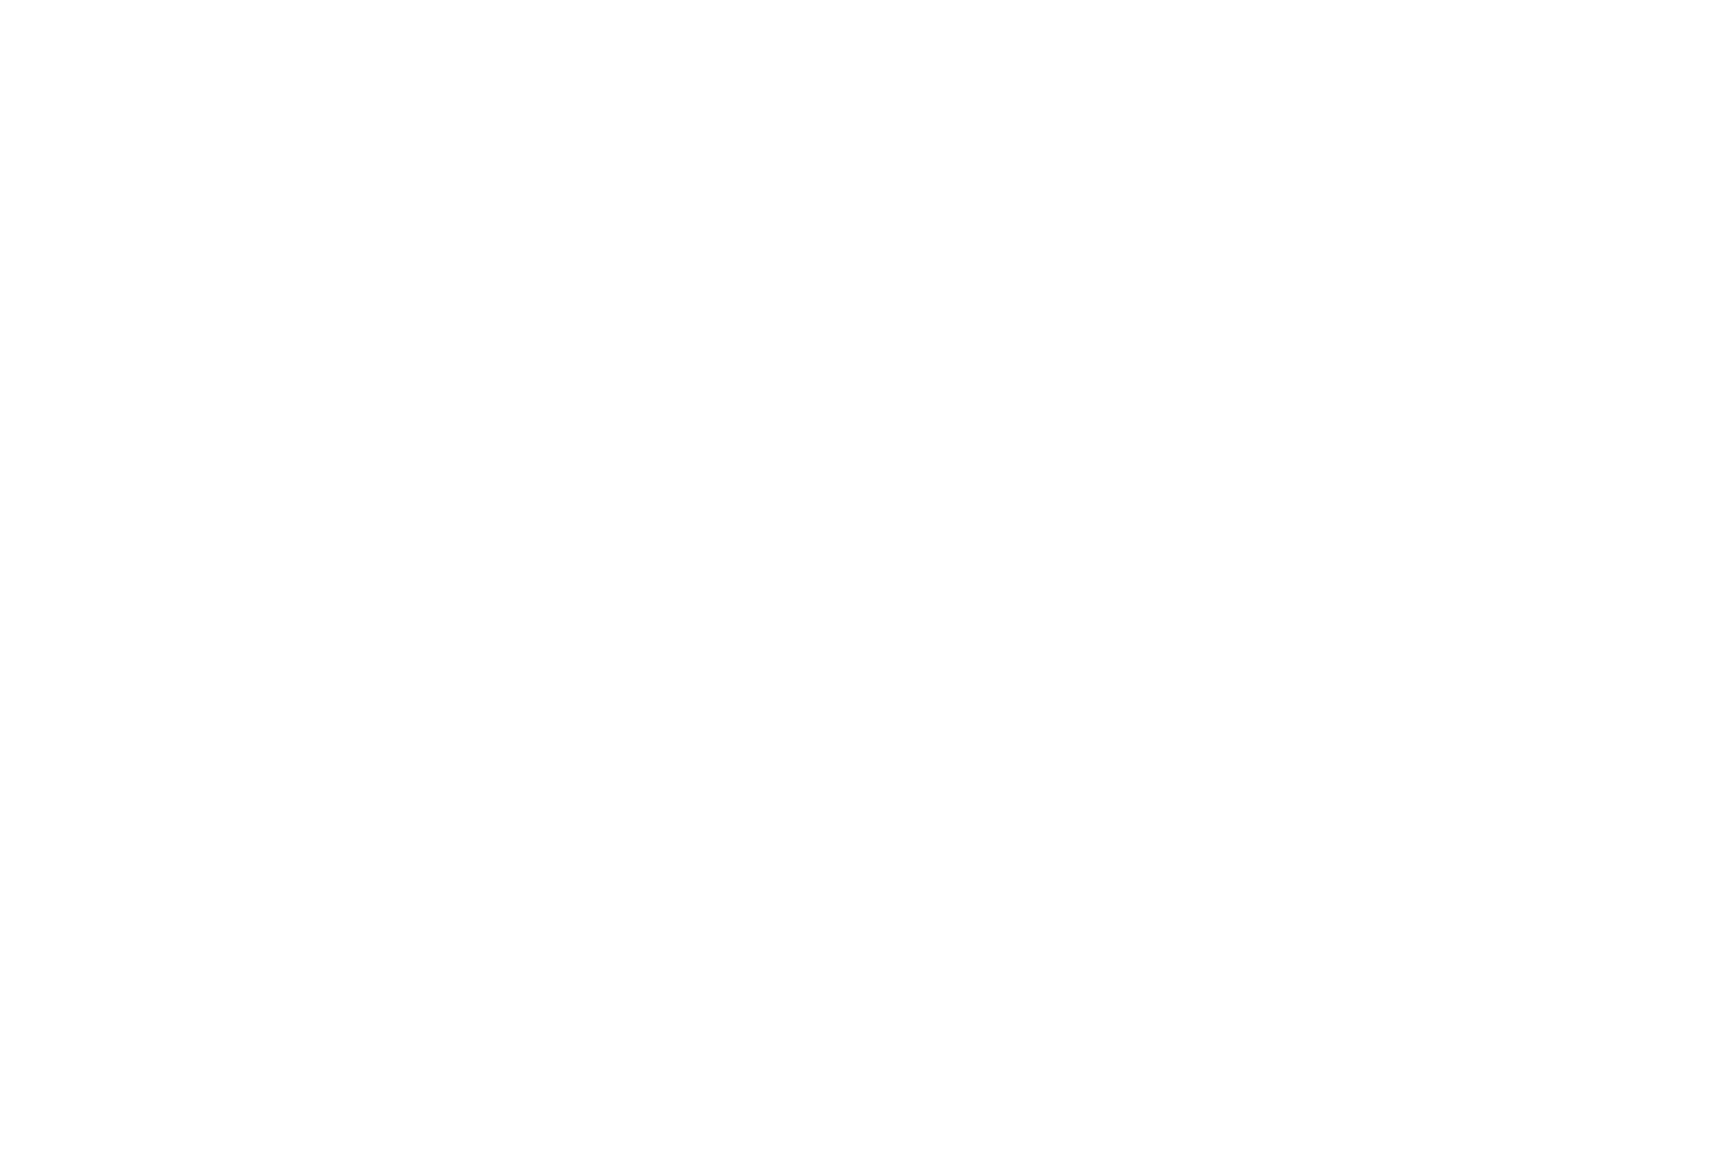 WINNER - I See You Awards - 2020